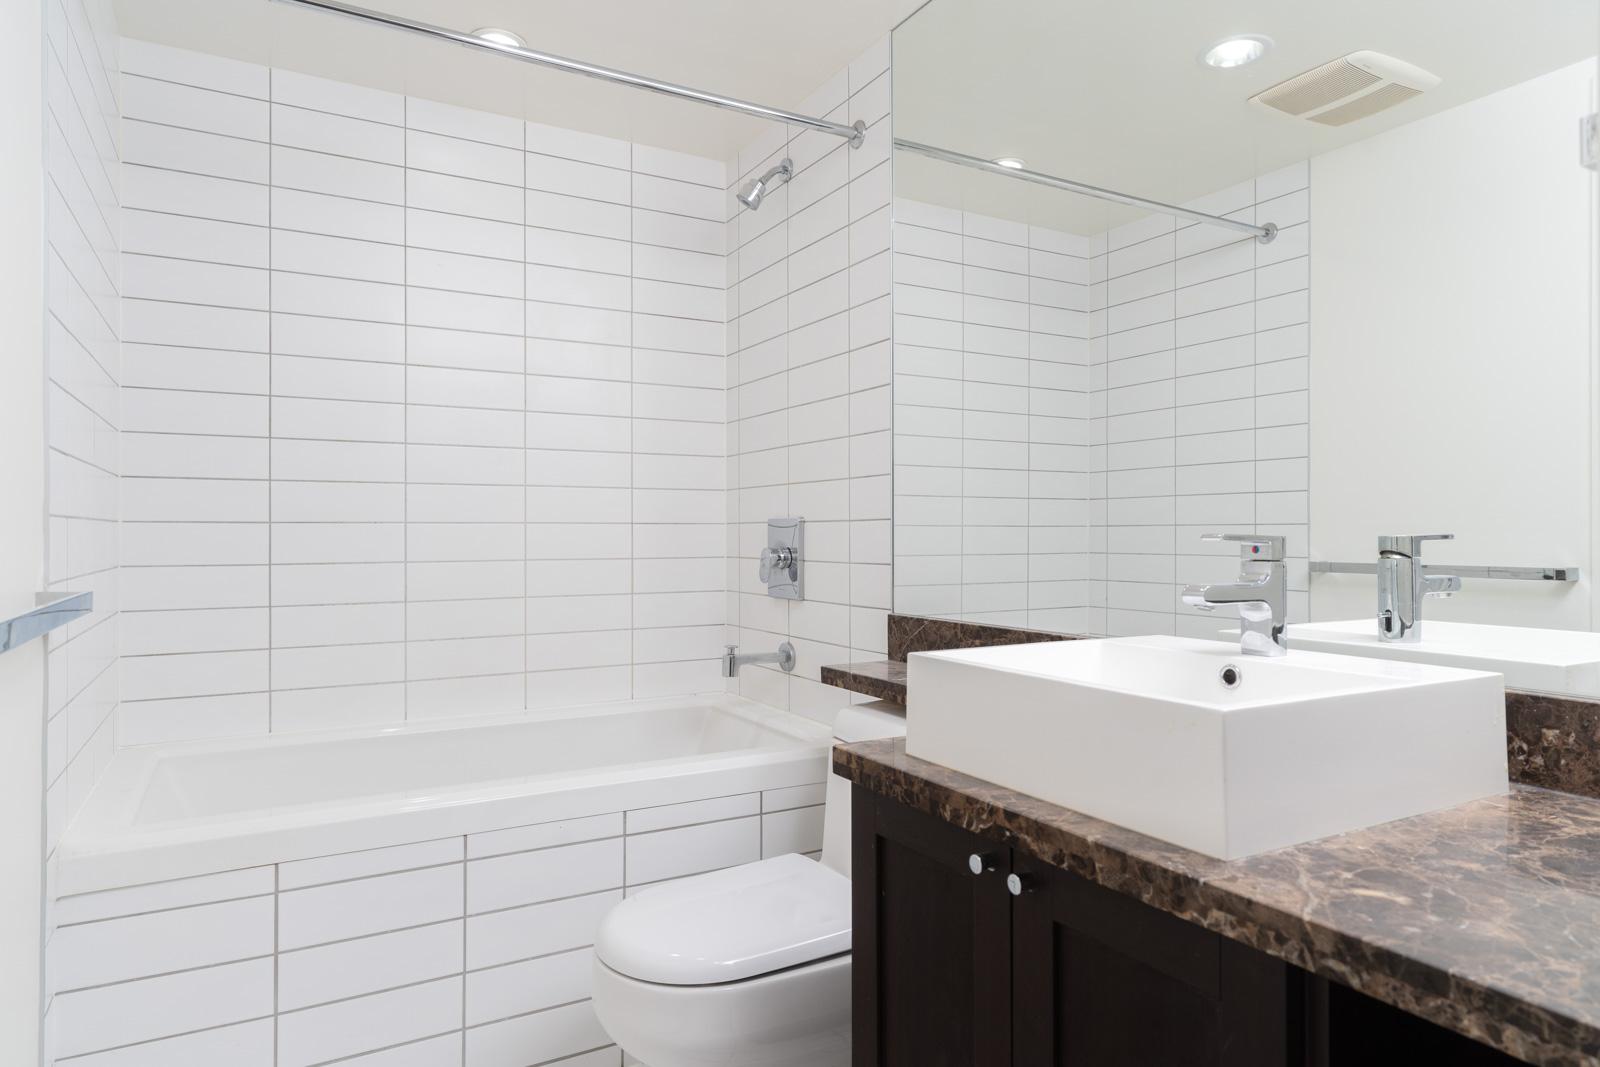 Bathroom with white walls and bathtub